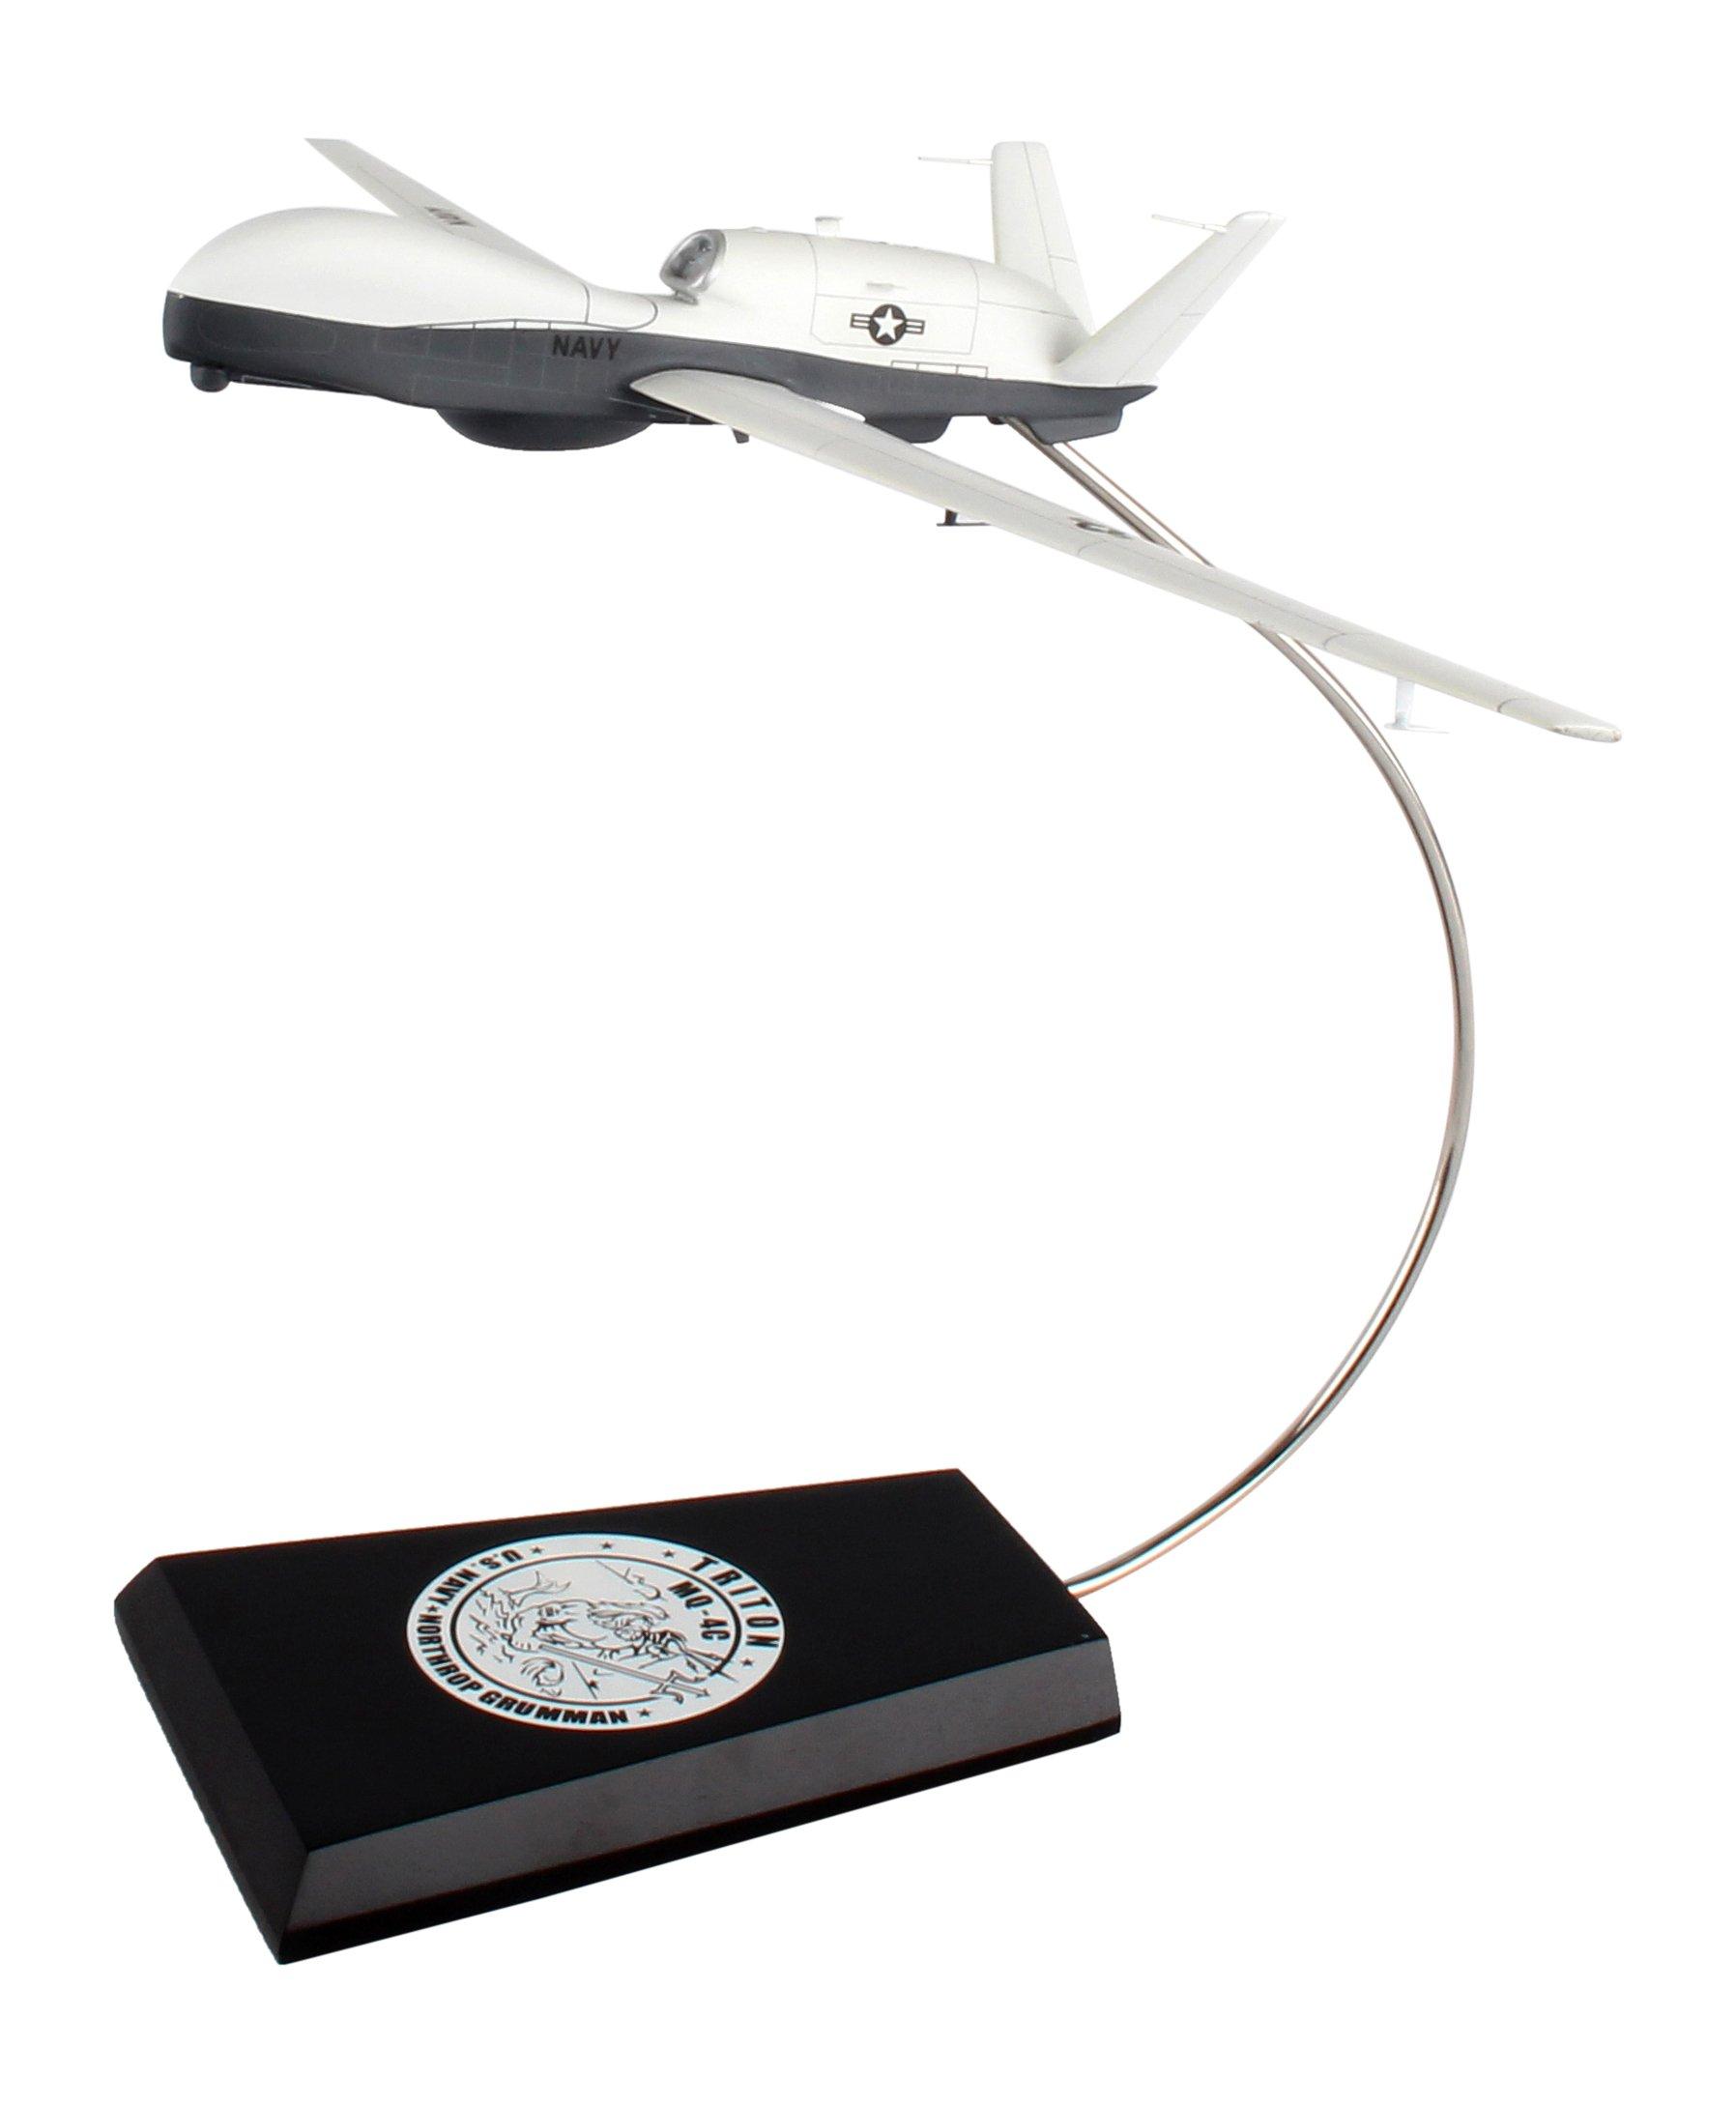 Executive Series Models MQ-4C Triton Building Kit (1/78 Scale)